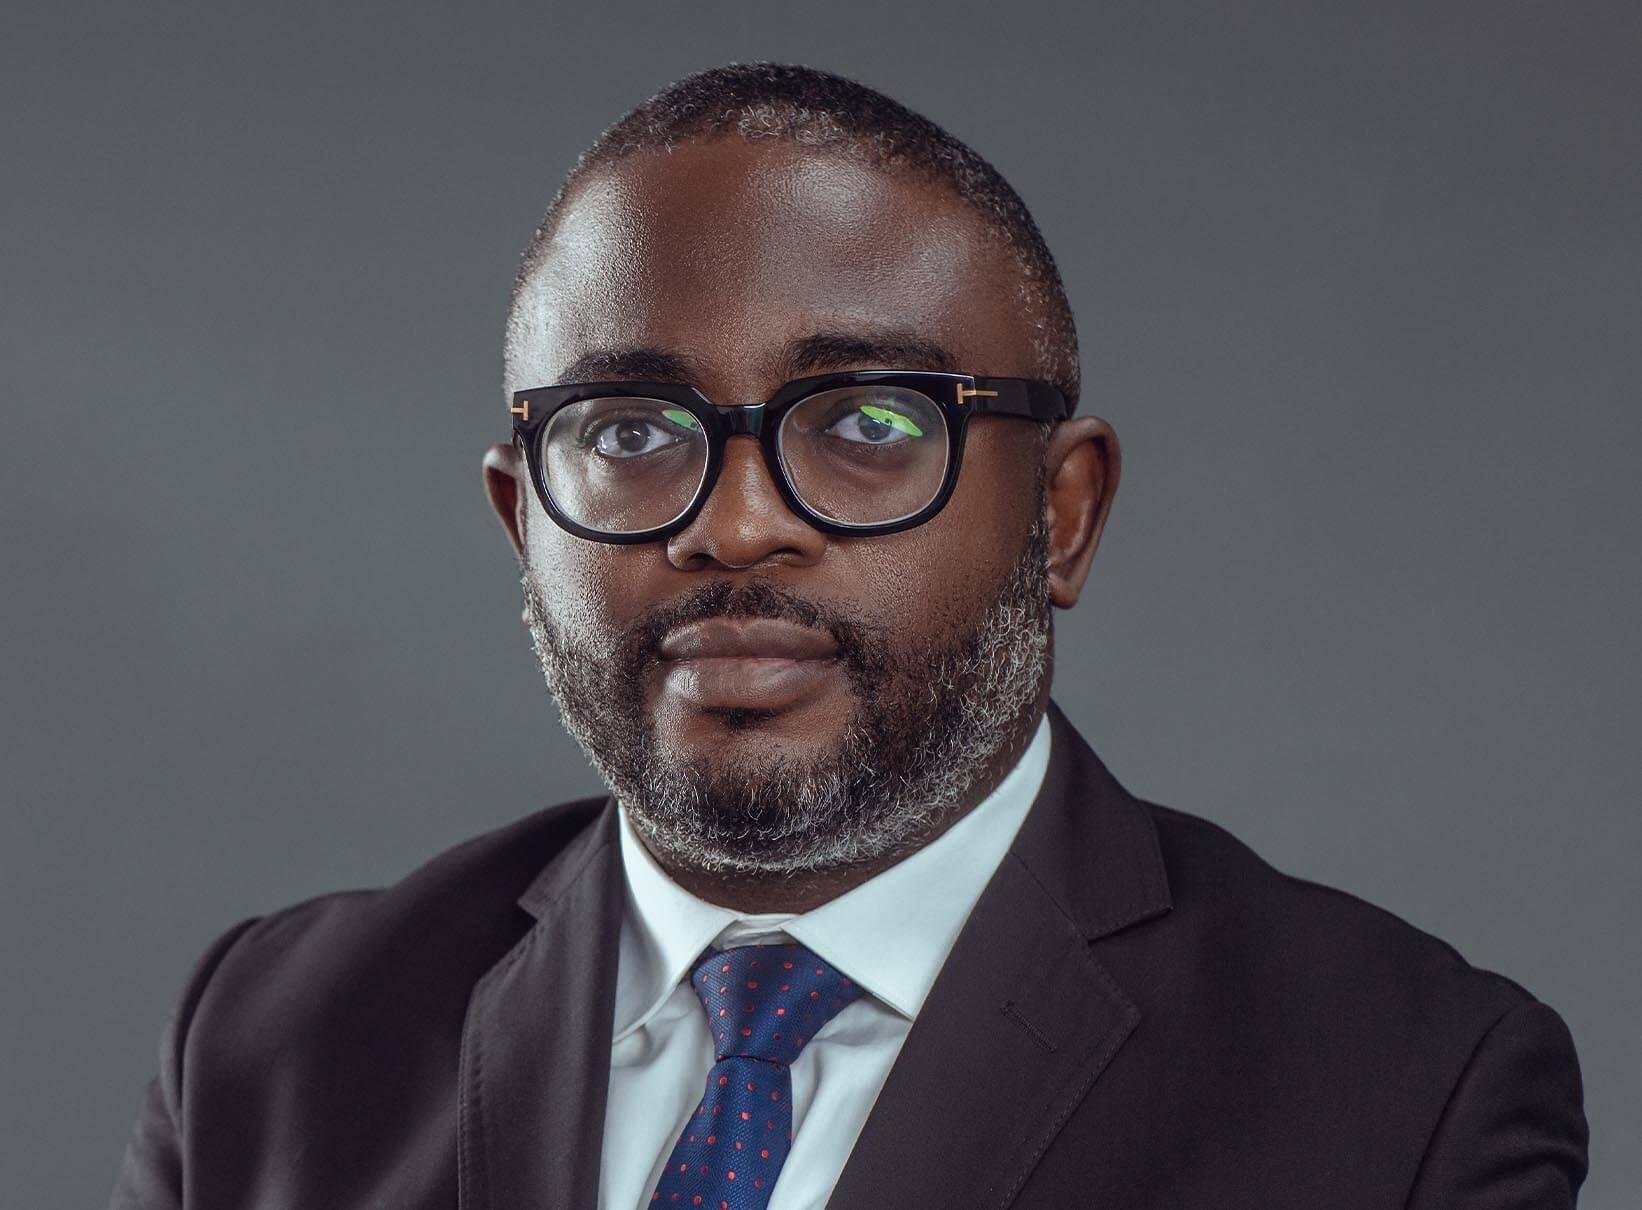 Mr. Ugochukwu Ndubuisi